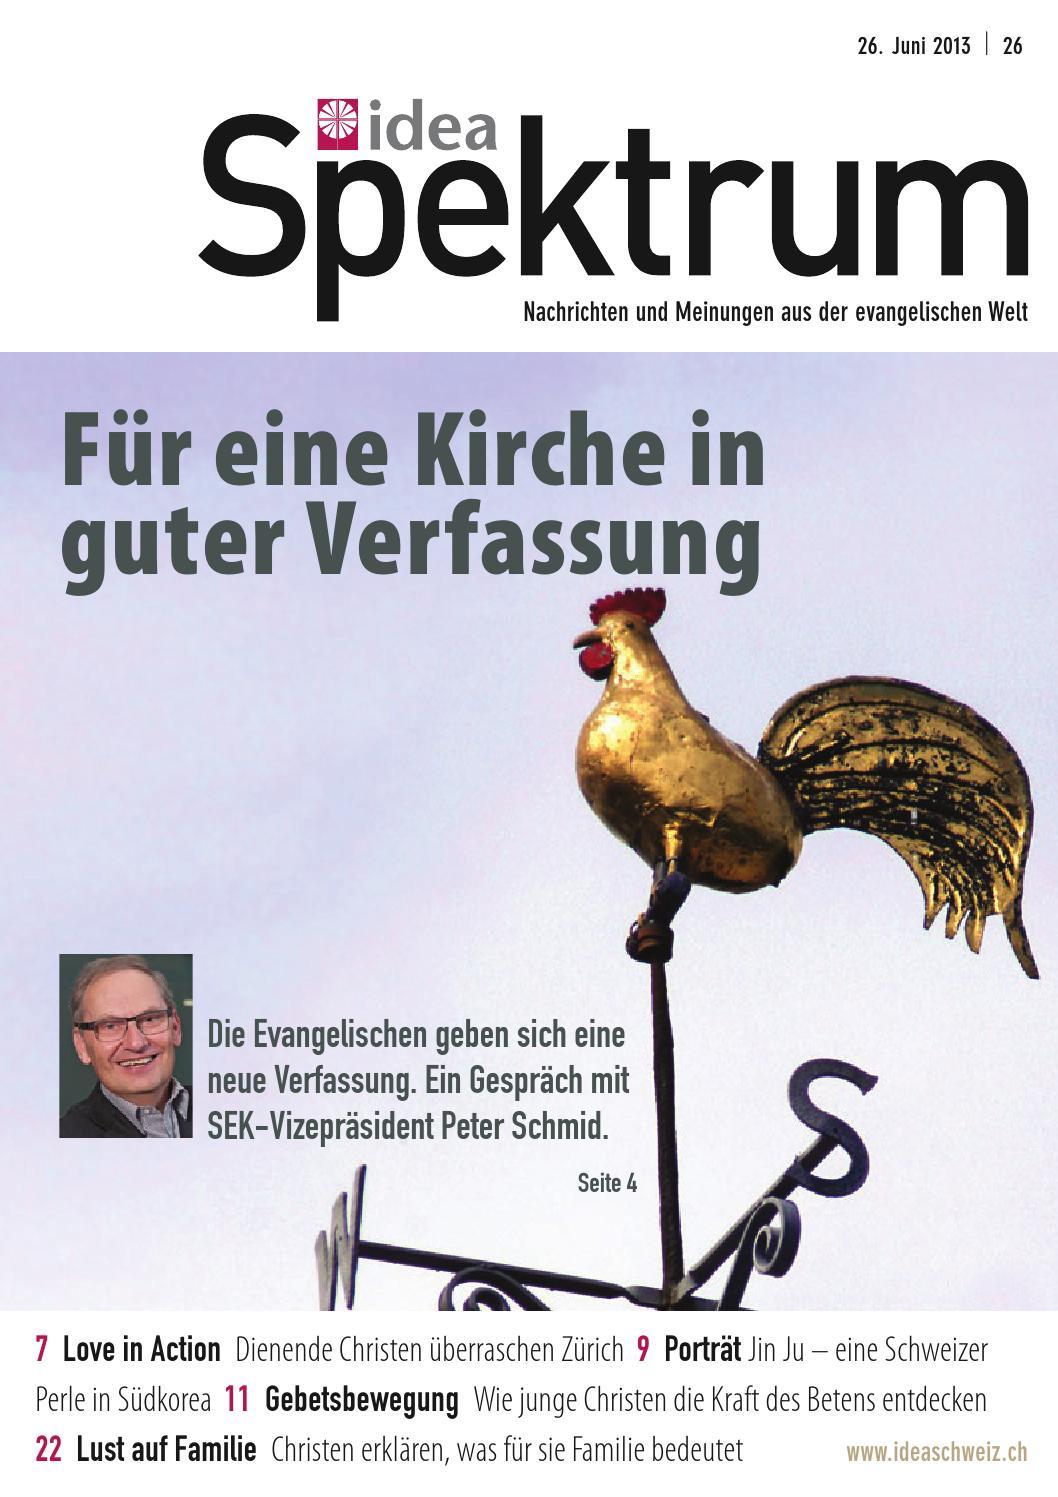 Christliche Partnersuche bubble-sheet.com - gratis